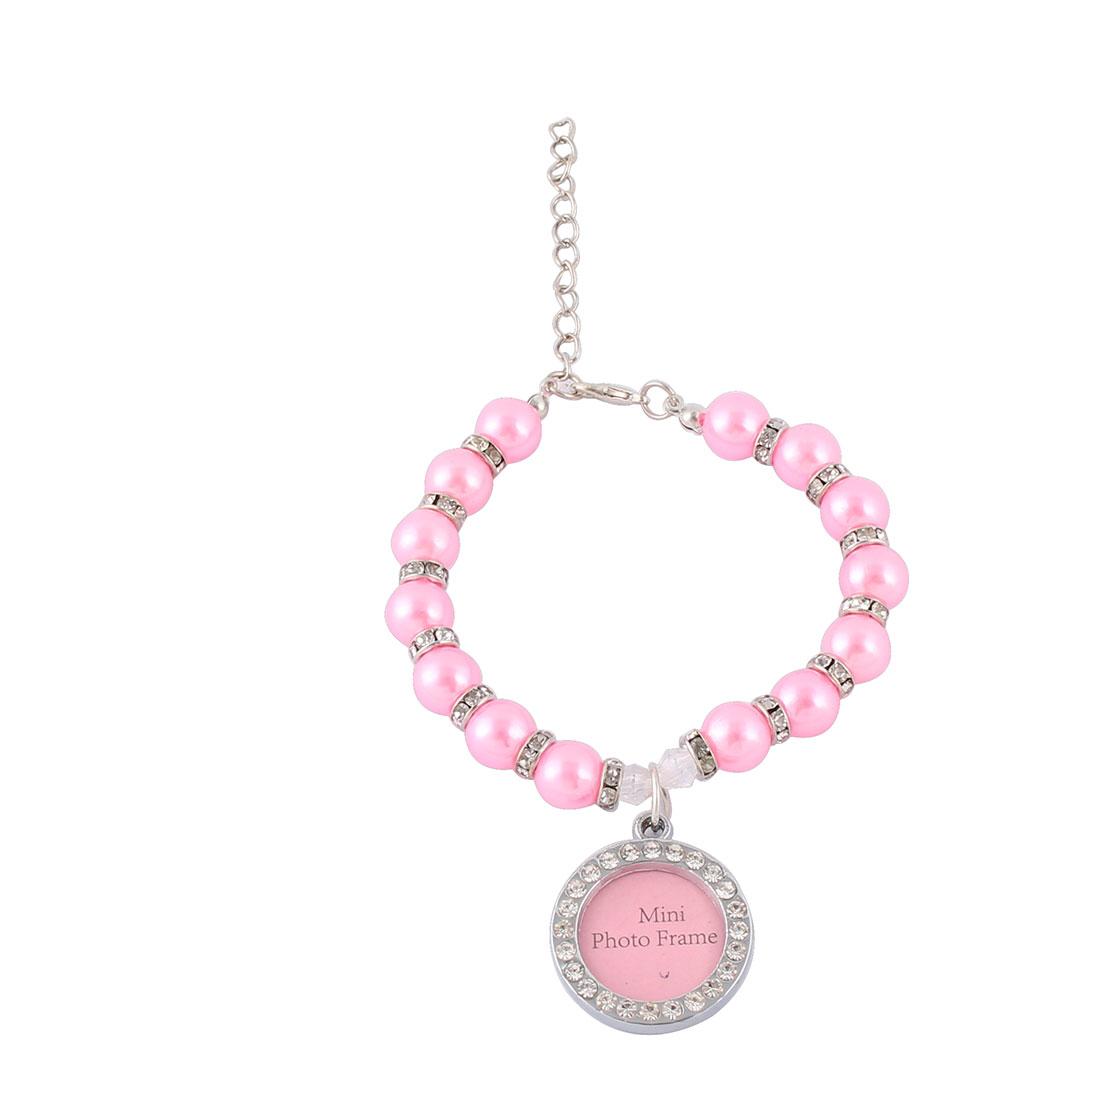 Cat Plastic Imitation Pearl Shining Rhinestone Photo Frame Pendant Tag Pet Necklace Collar Dark Pink